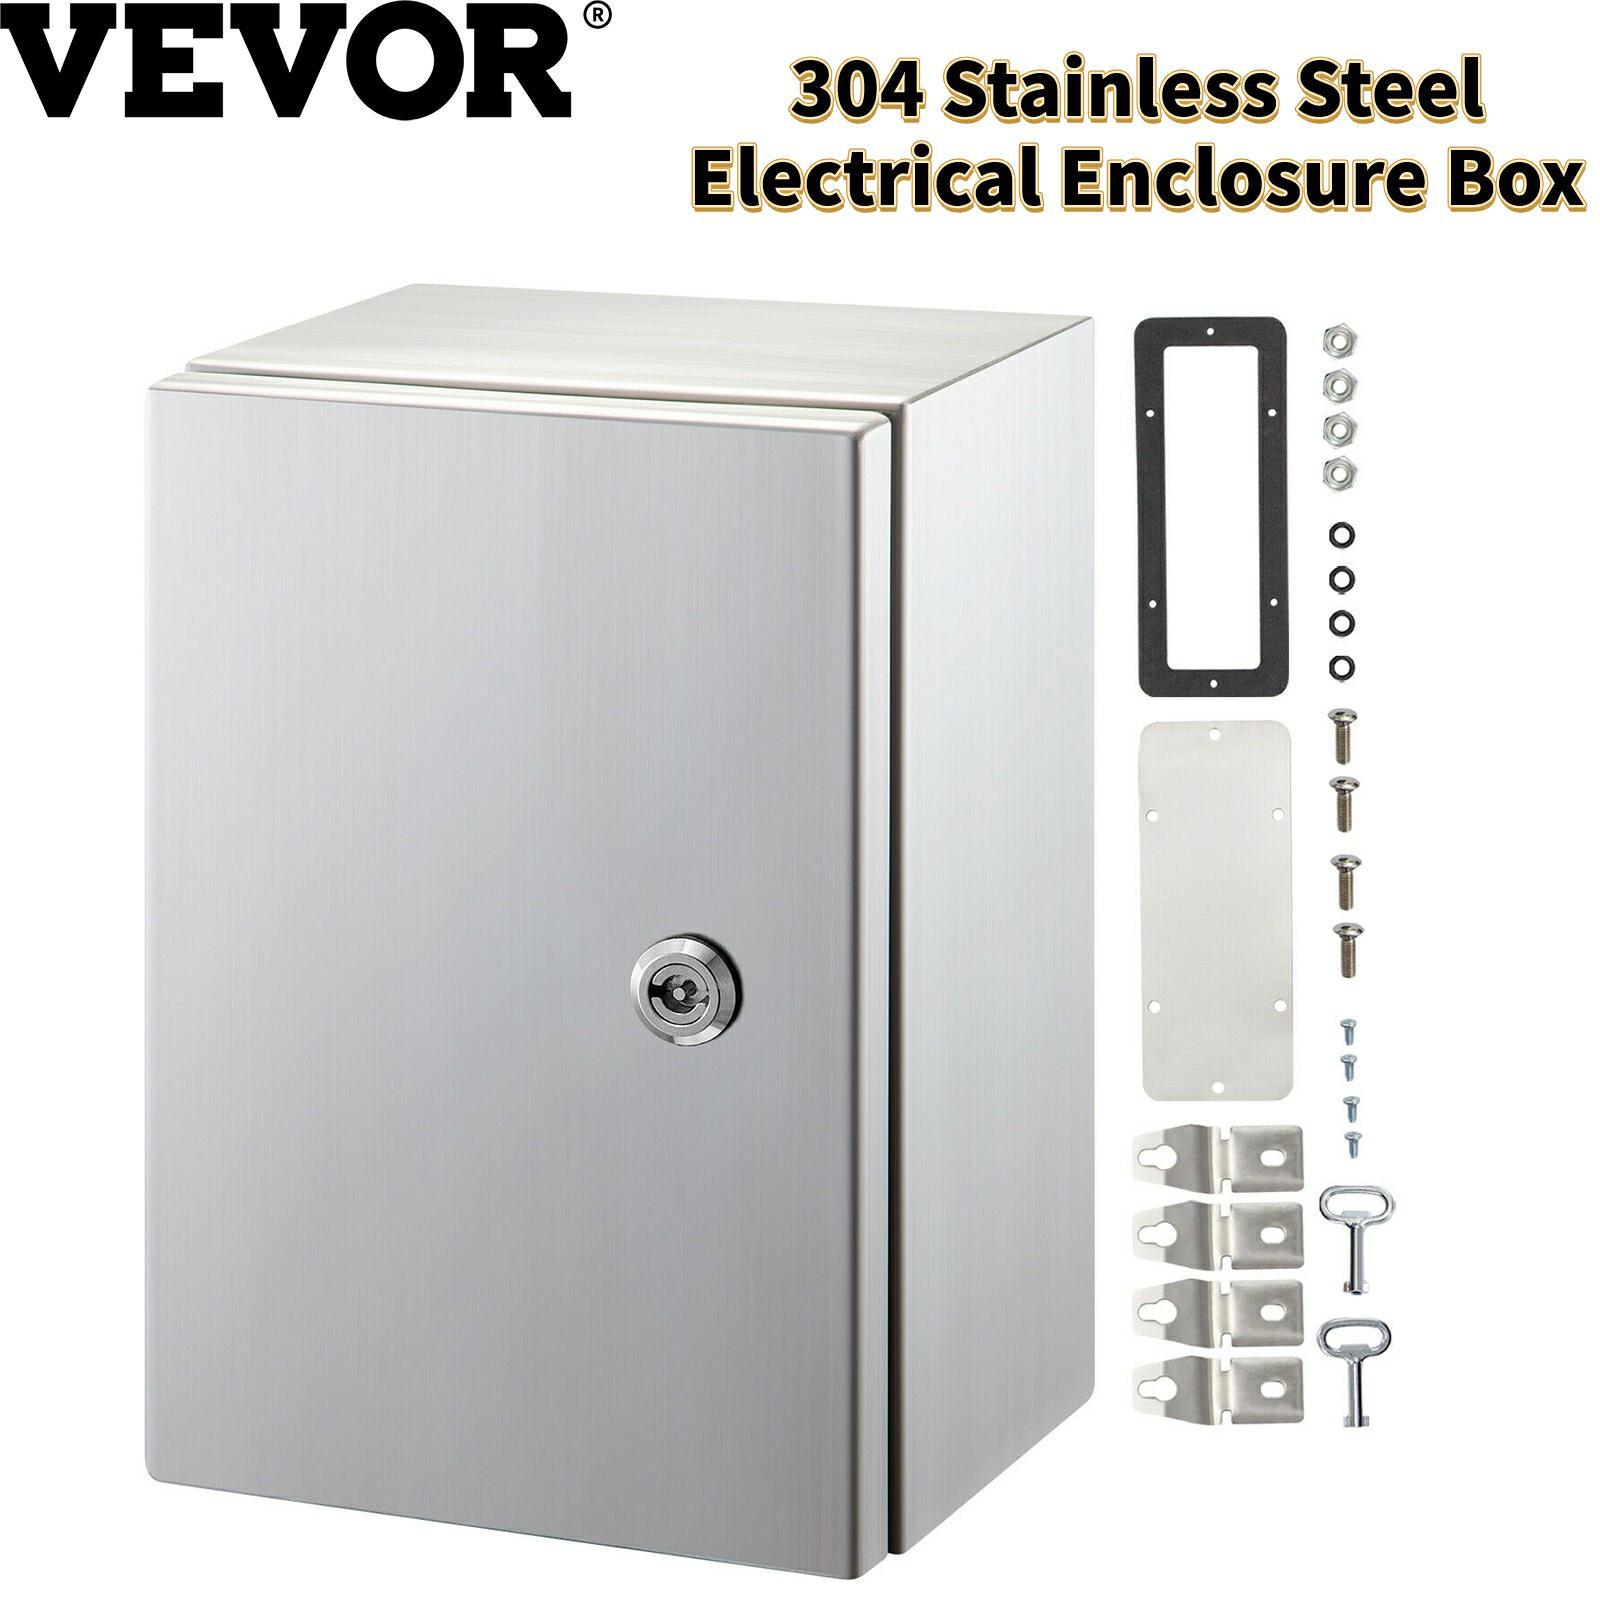 VEVOR صندوق الضميمة الكهربائية 304 الفولاذ المقاوم للصدأ سميكة قفل الغبار IP65 مقاوم للماء لحماية الدوائر الداخلية والخارجية